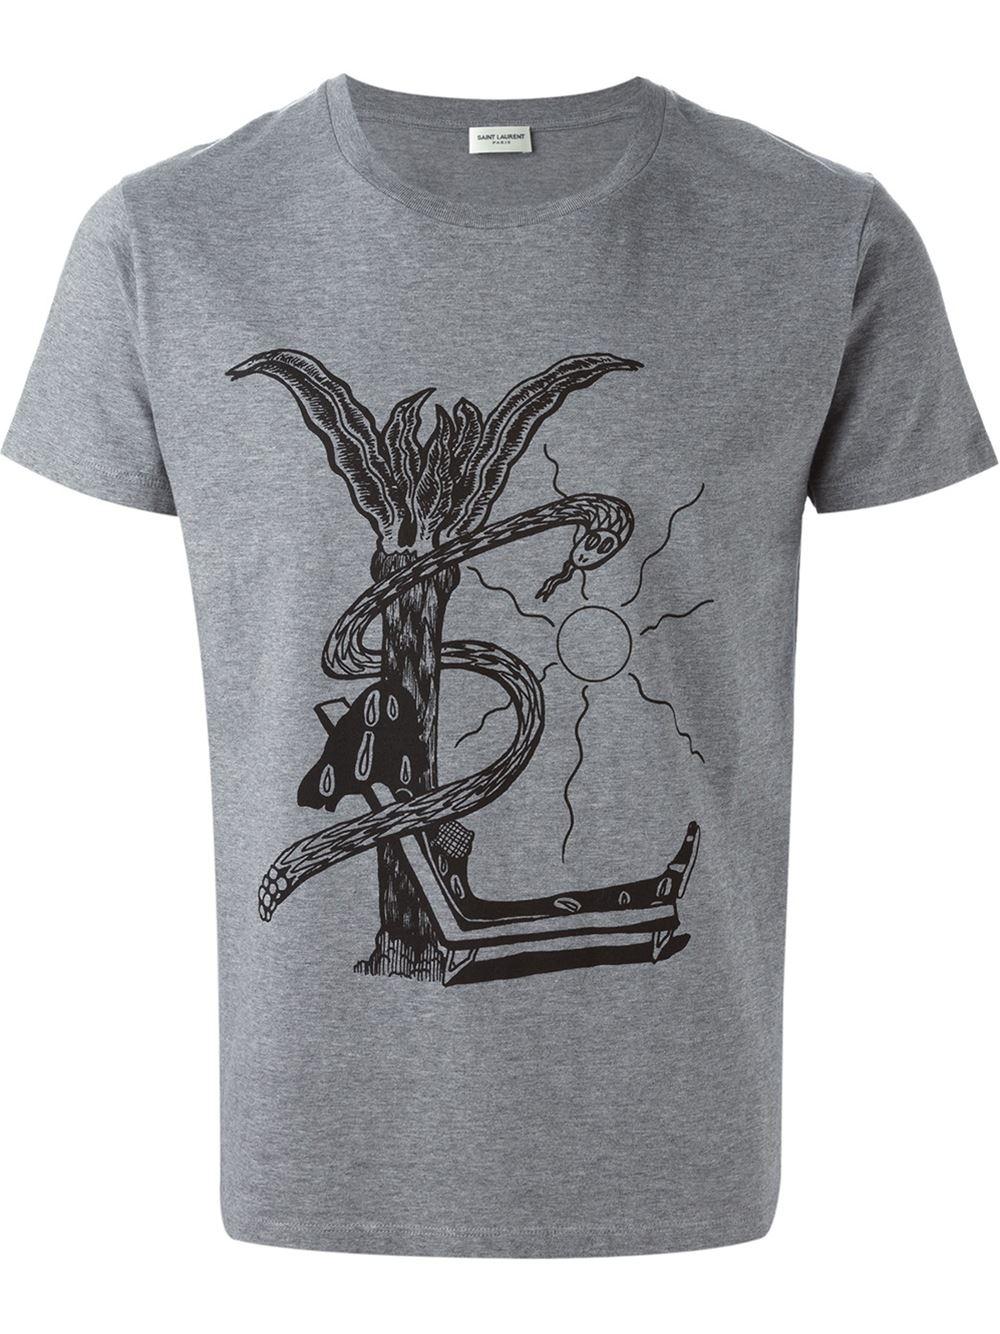 Saint laurent abstract logo print t shirt in gray for men for Saint laurent t shirt